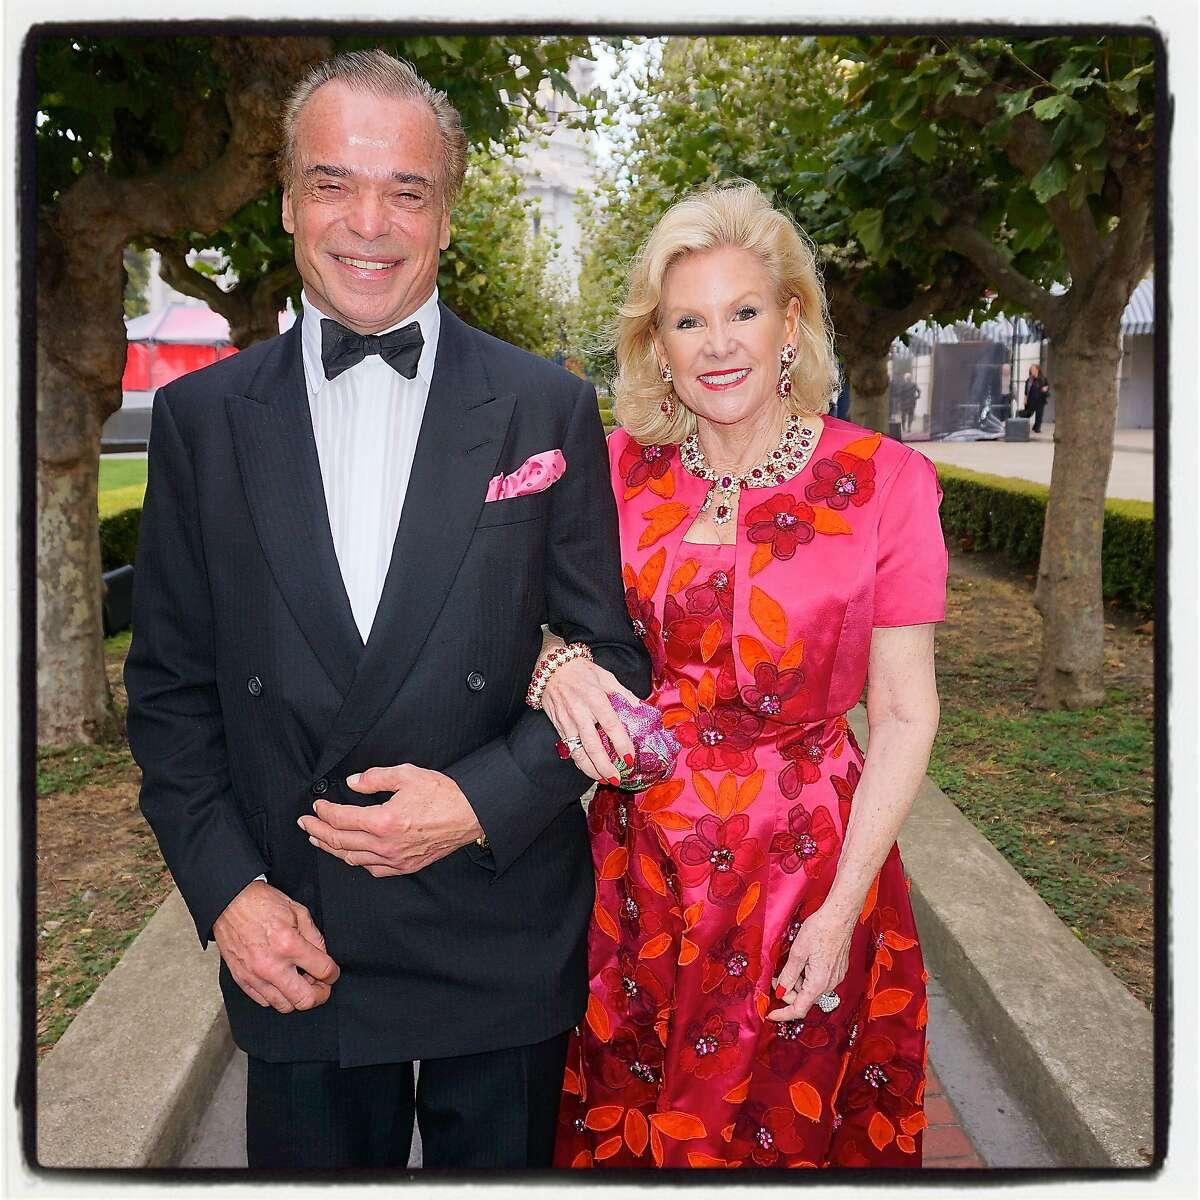 Oscar de la Renta exec Boaz Mazor and Opera Opening Weekend Grand Sponsor Dede Wilsey at the SF Opera Ball. Sept 2016.